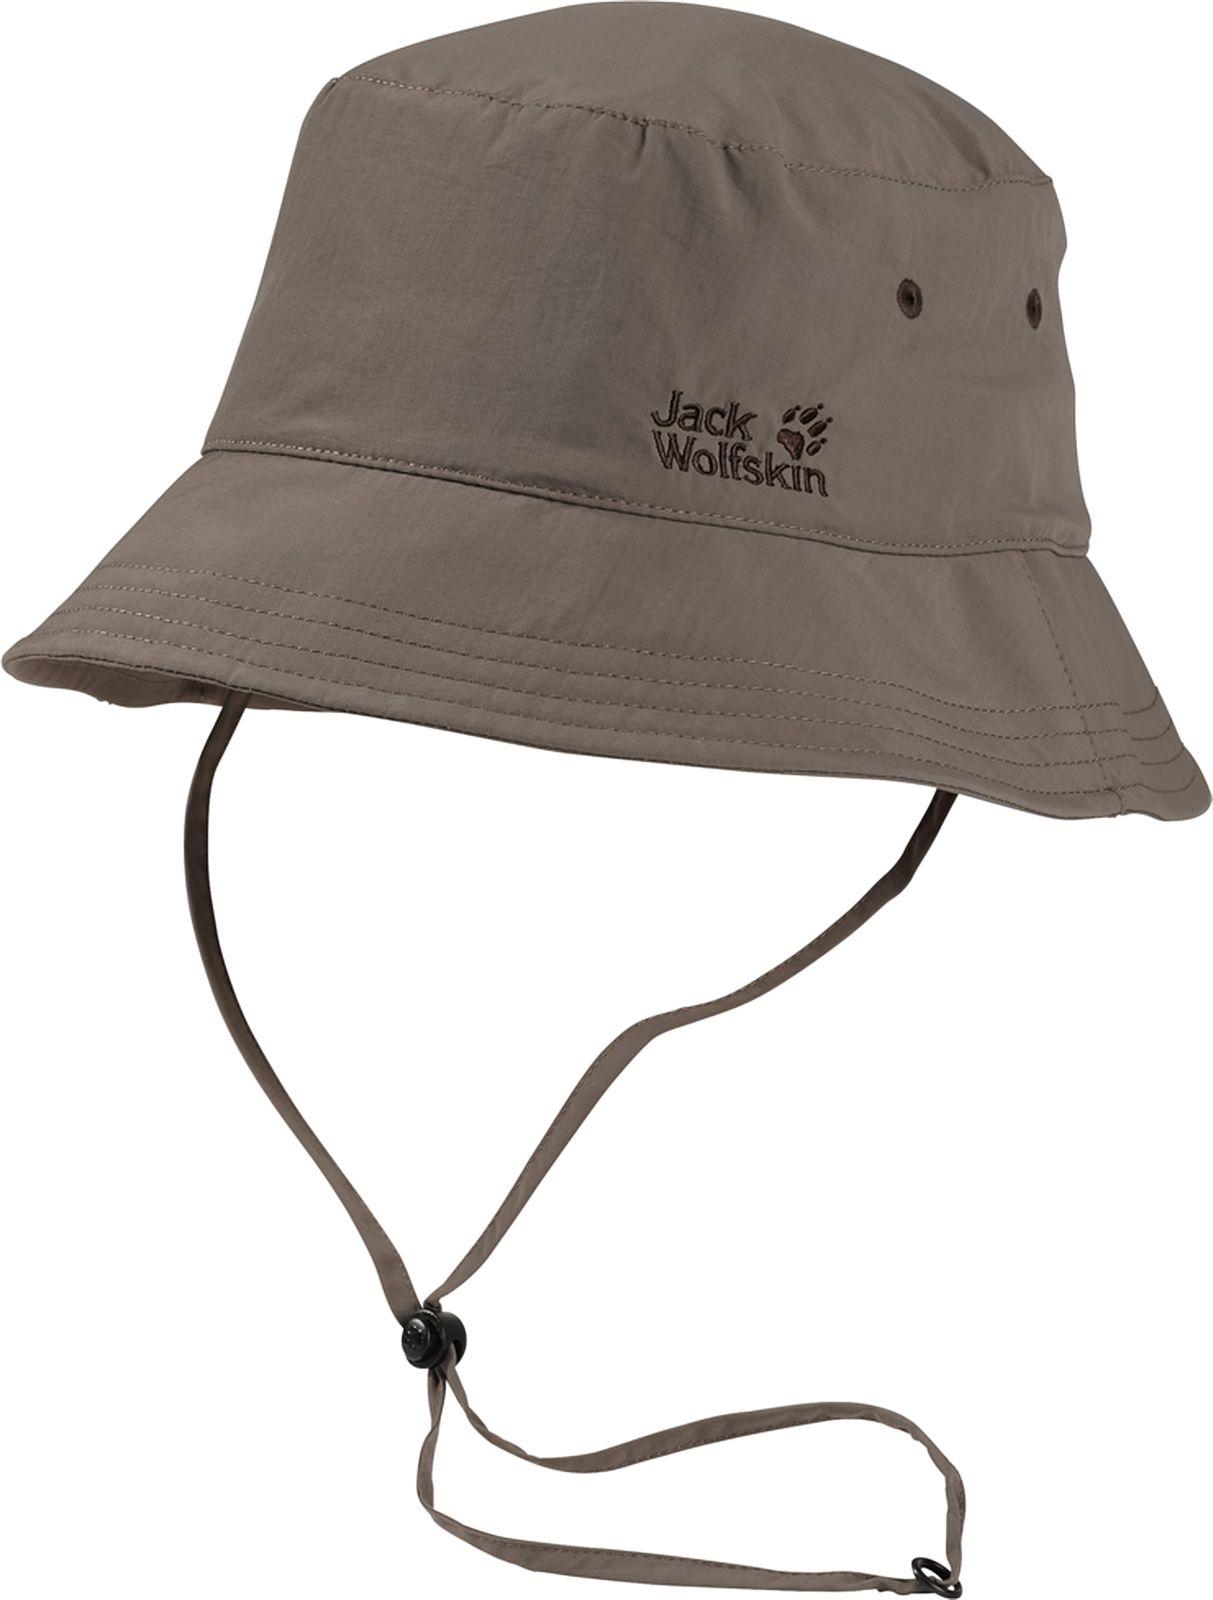 Панама Jack Wolfskin Supplex Sun Hat, цвет: темно-бежевый. 1903391-5116. Размер L (57/60) unique long band decorated adjustable sun hat